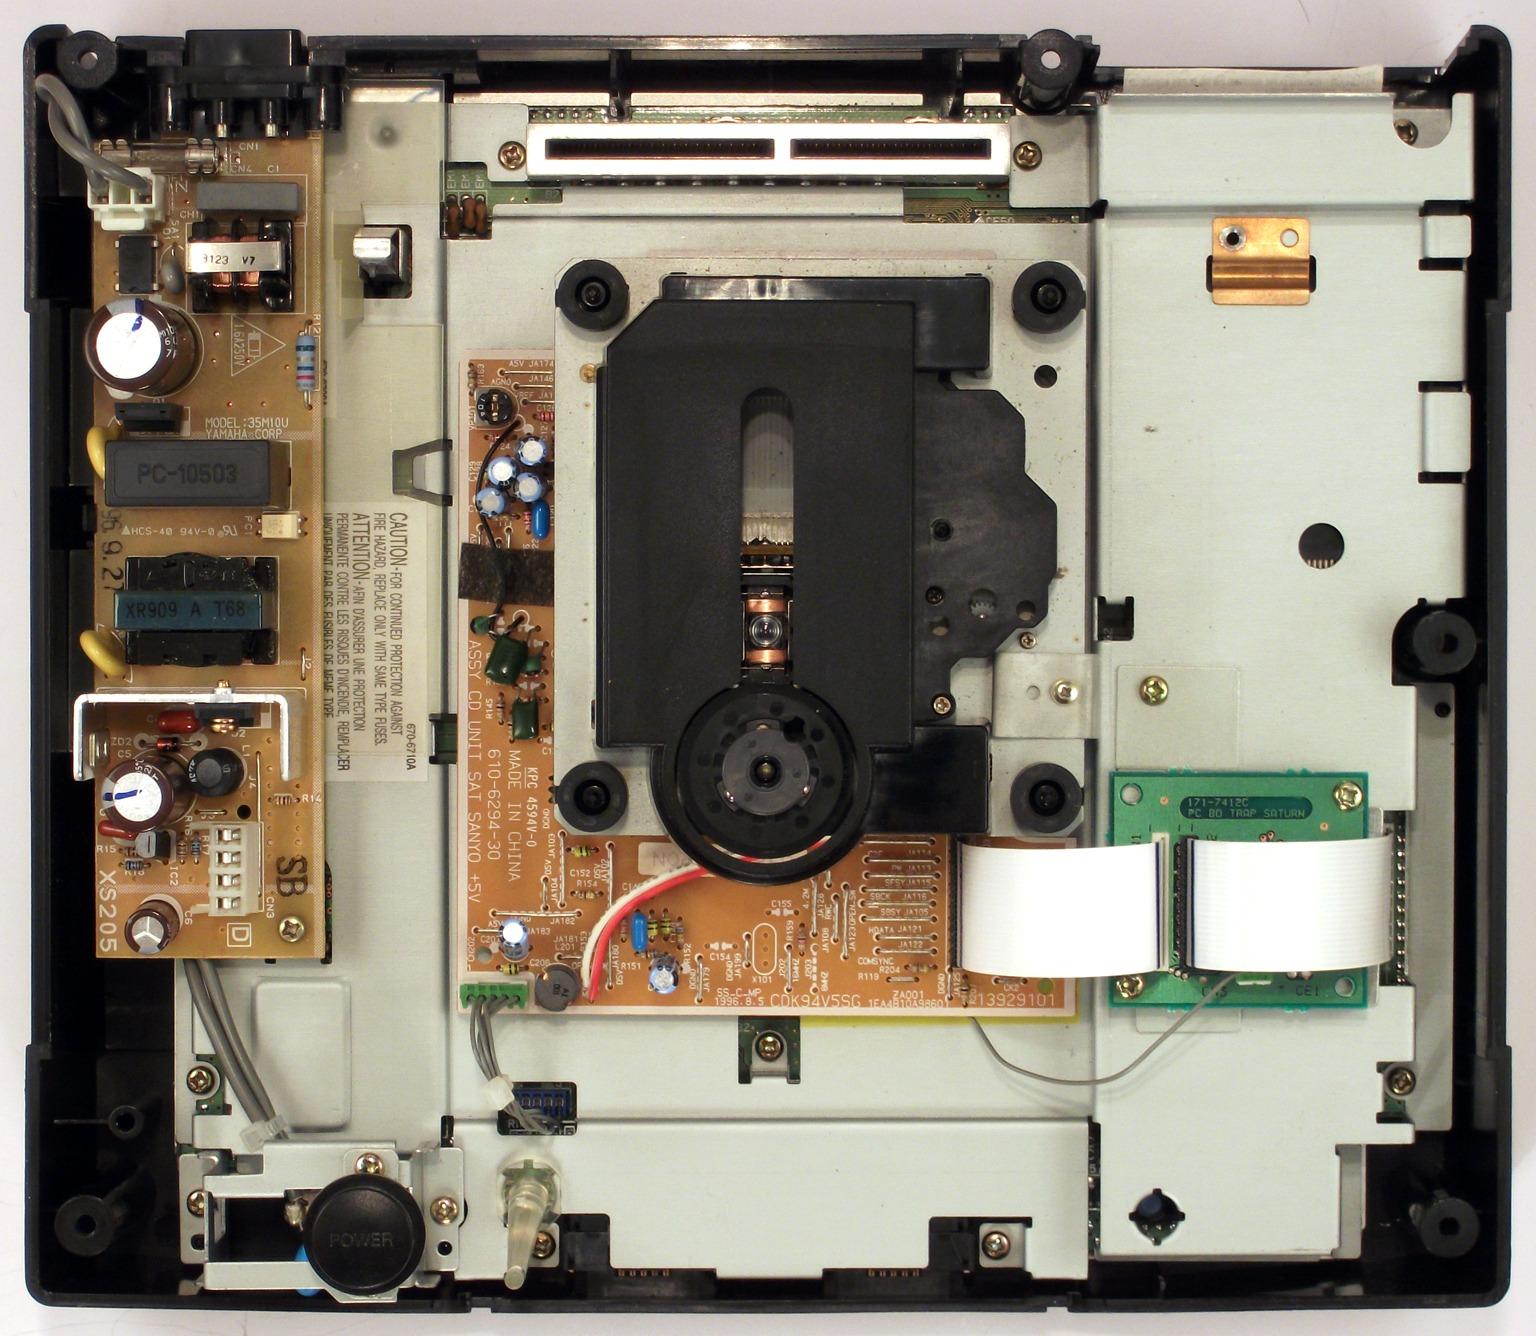 10-sega-saturn-model-2-usa-va10-with-sanyo-drive